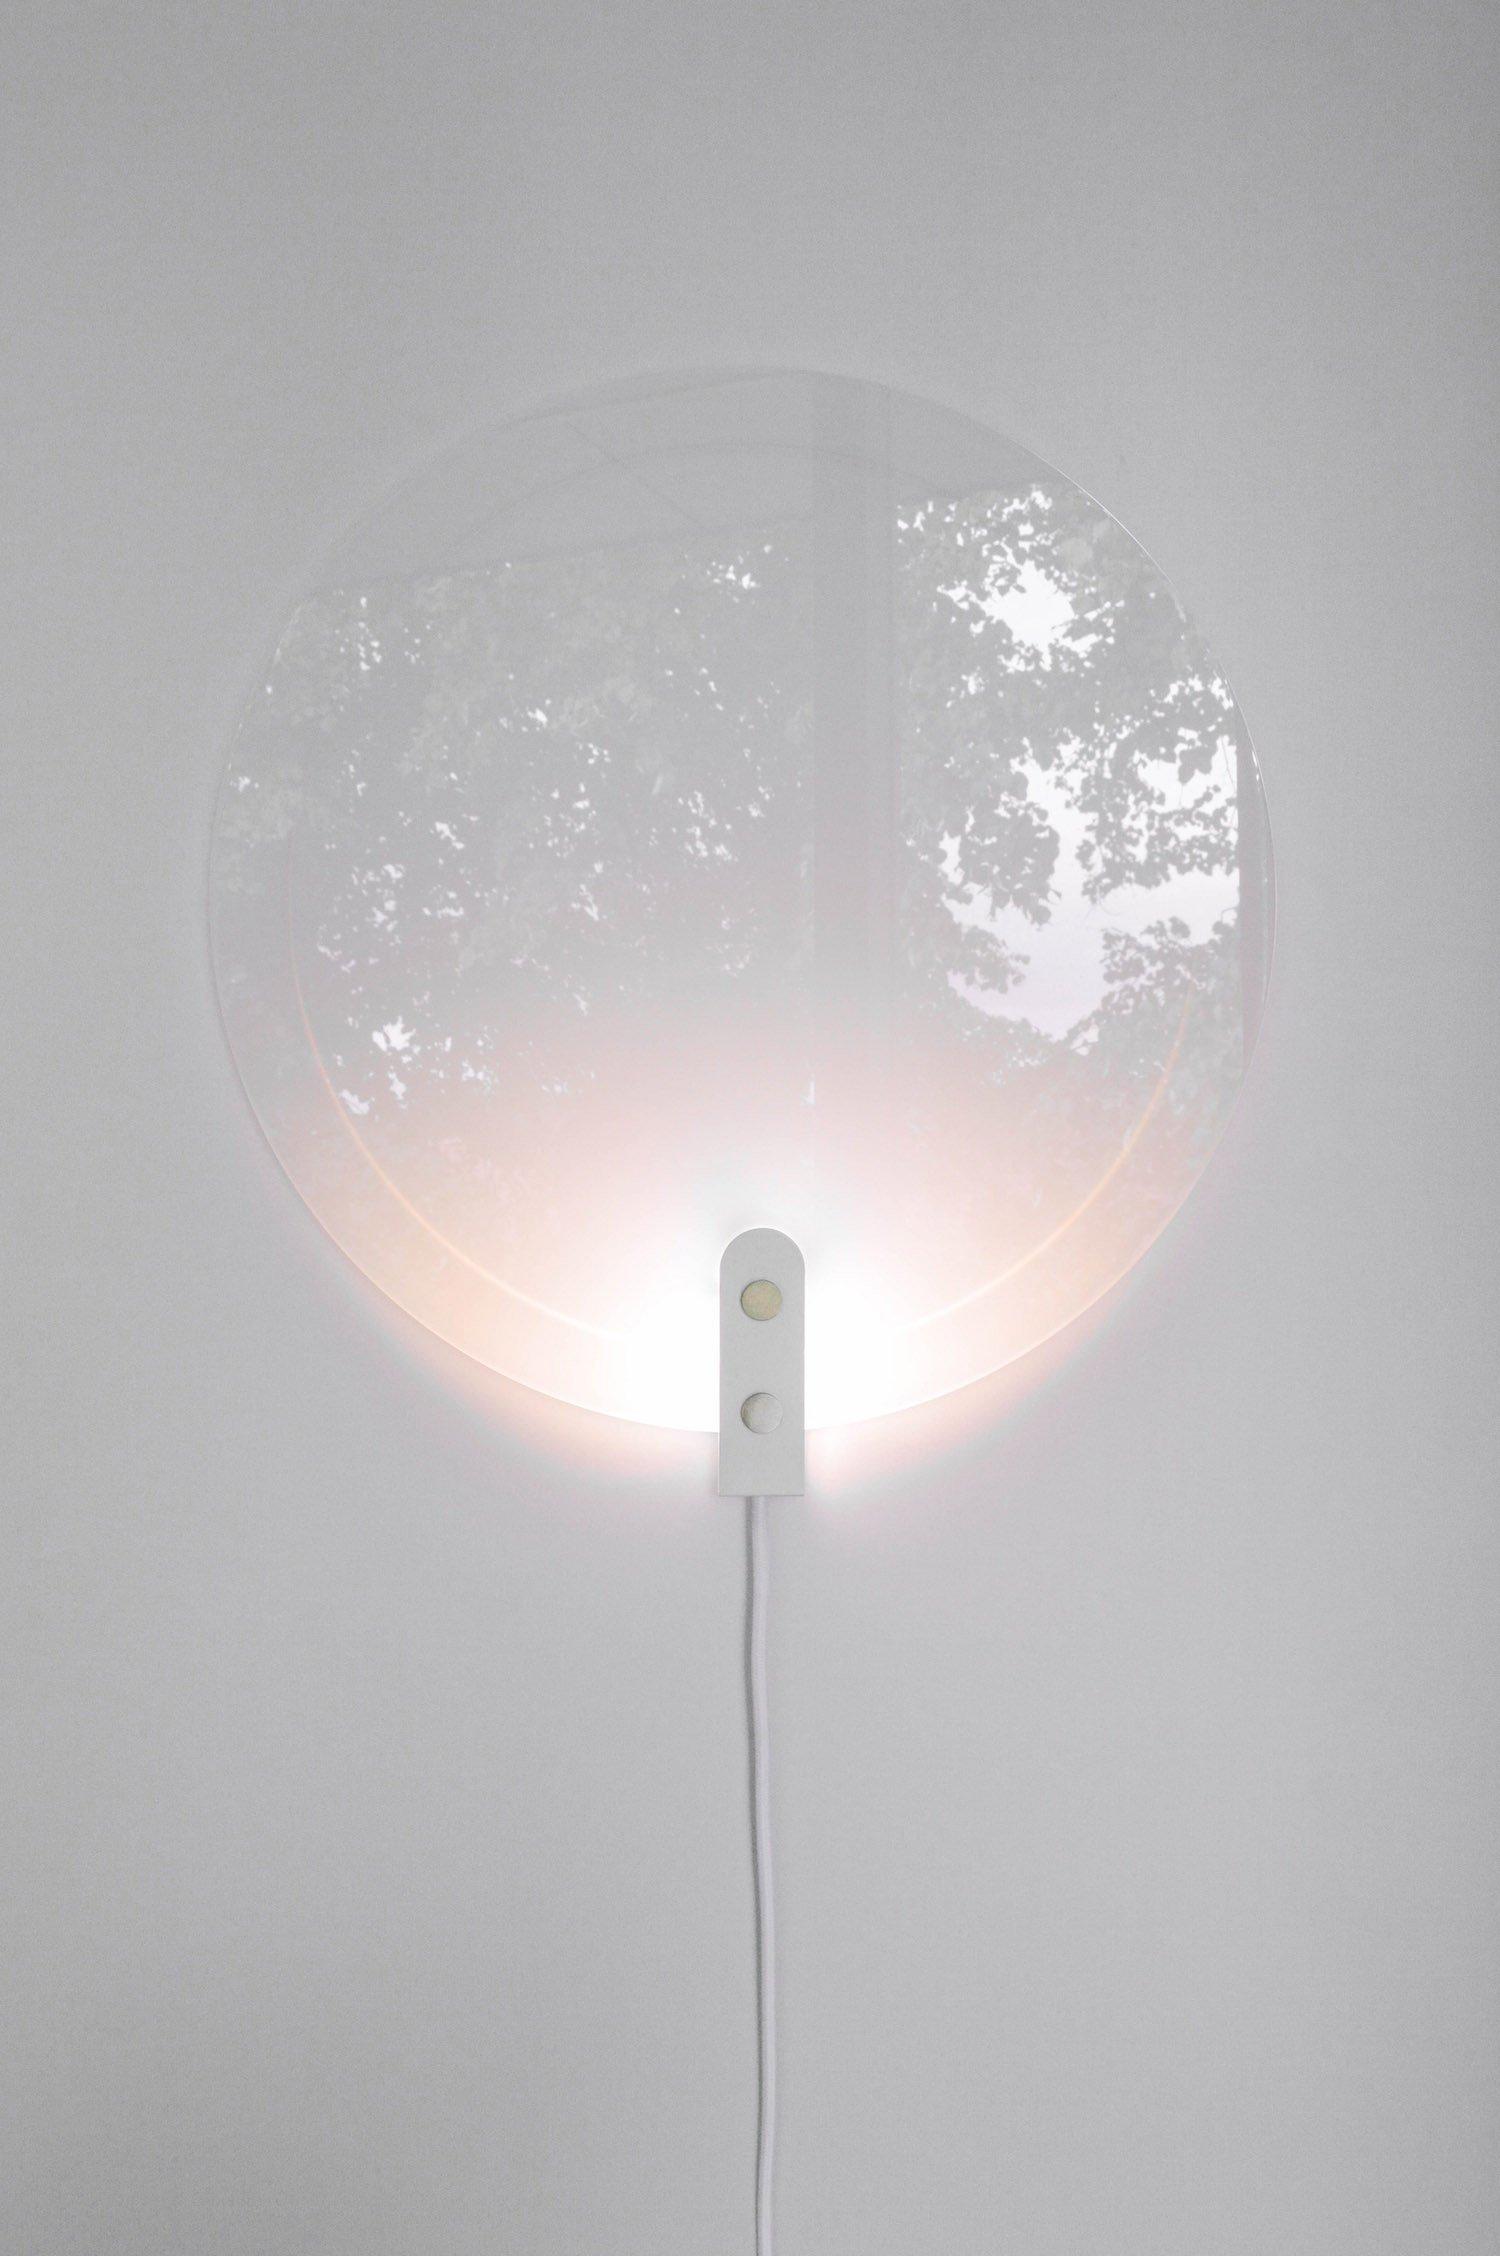 iGNANT_Design_Studio_Fabian_Zeijler Designs_Lamps_Sun_Gazing_07